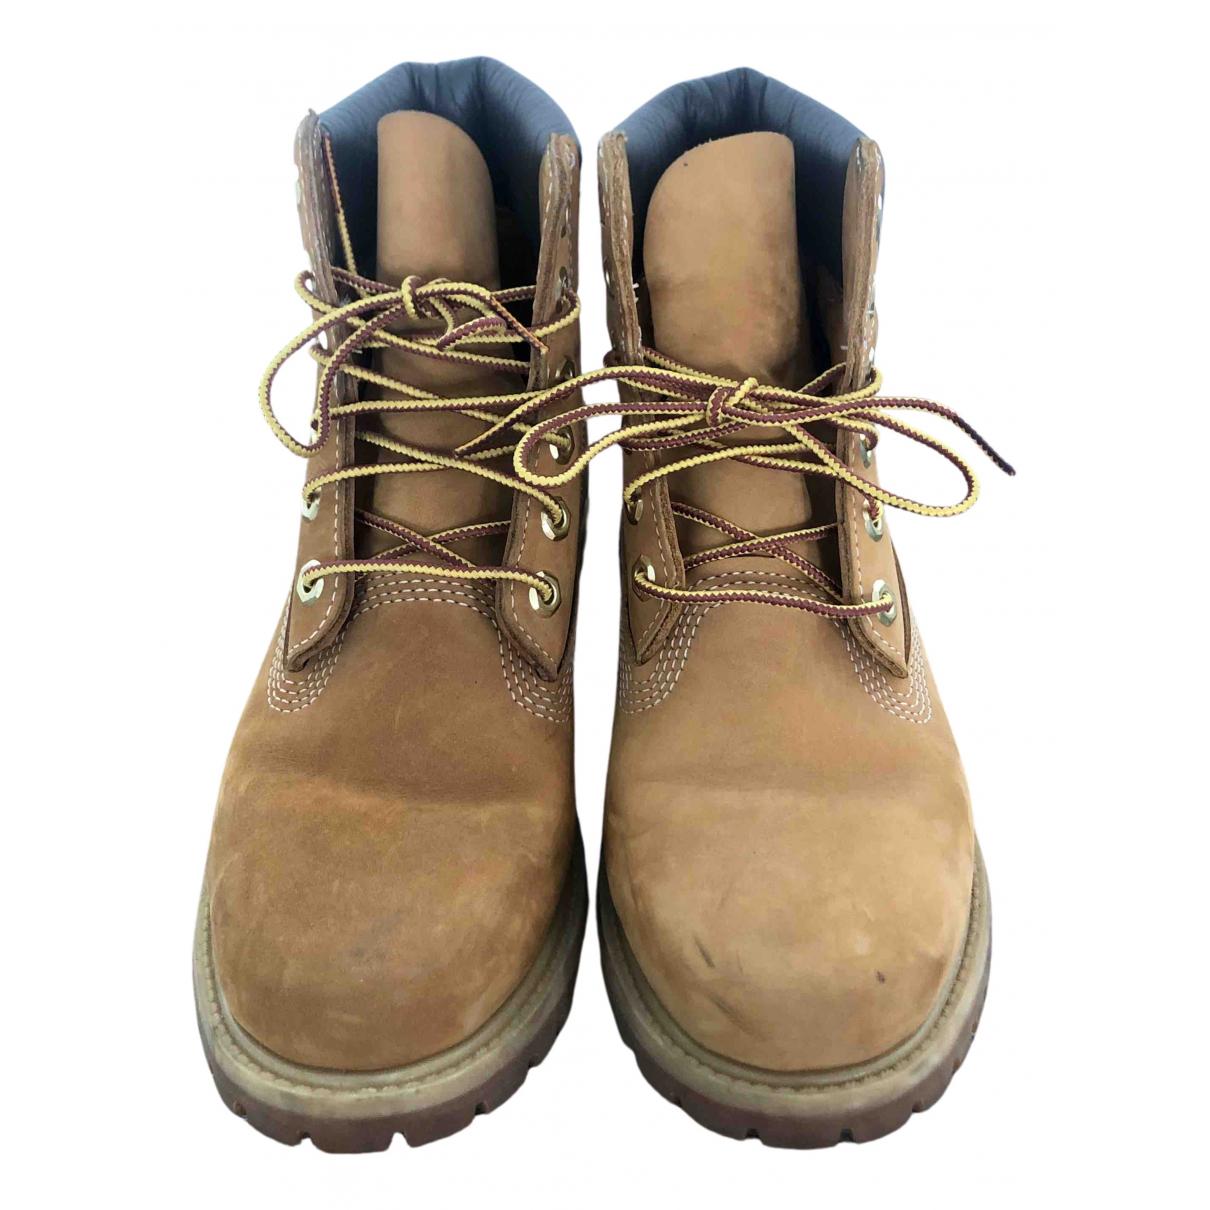 Timberland - Boots   pour femme en cuir - beige